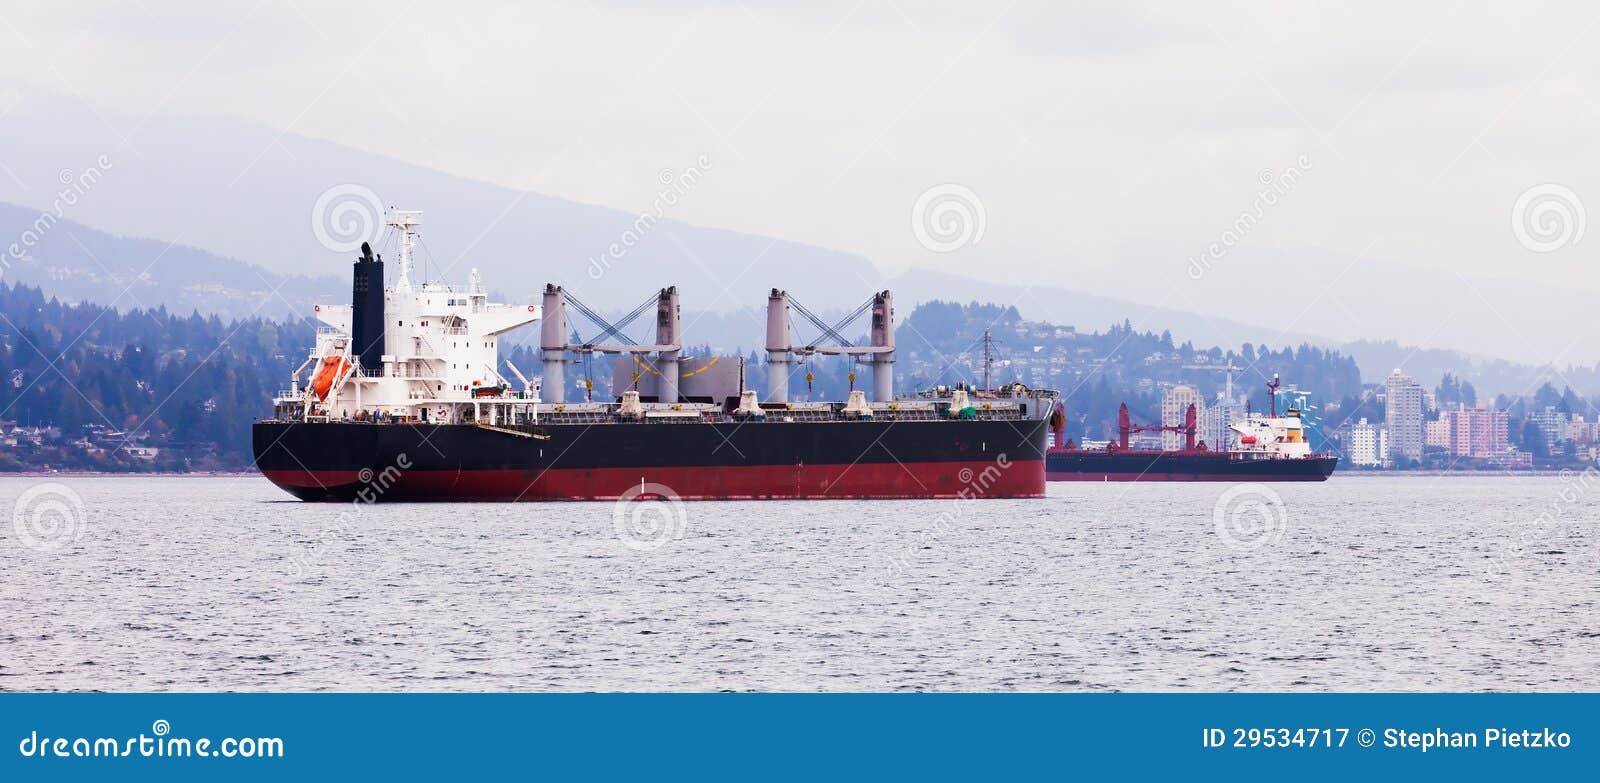 Pista de transporte litoral ocupada fora de Vancôver norte